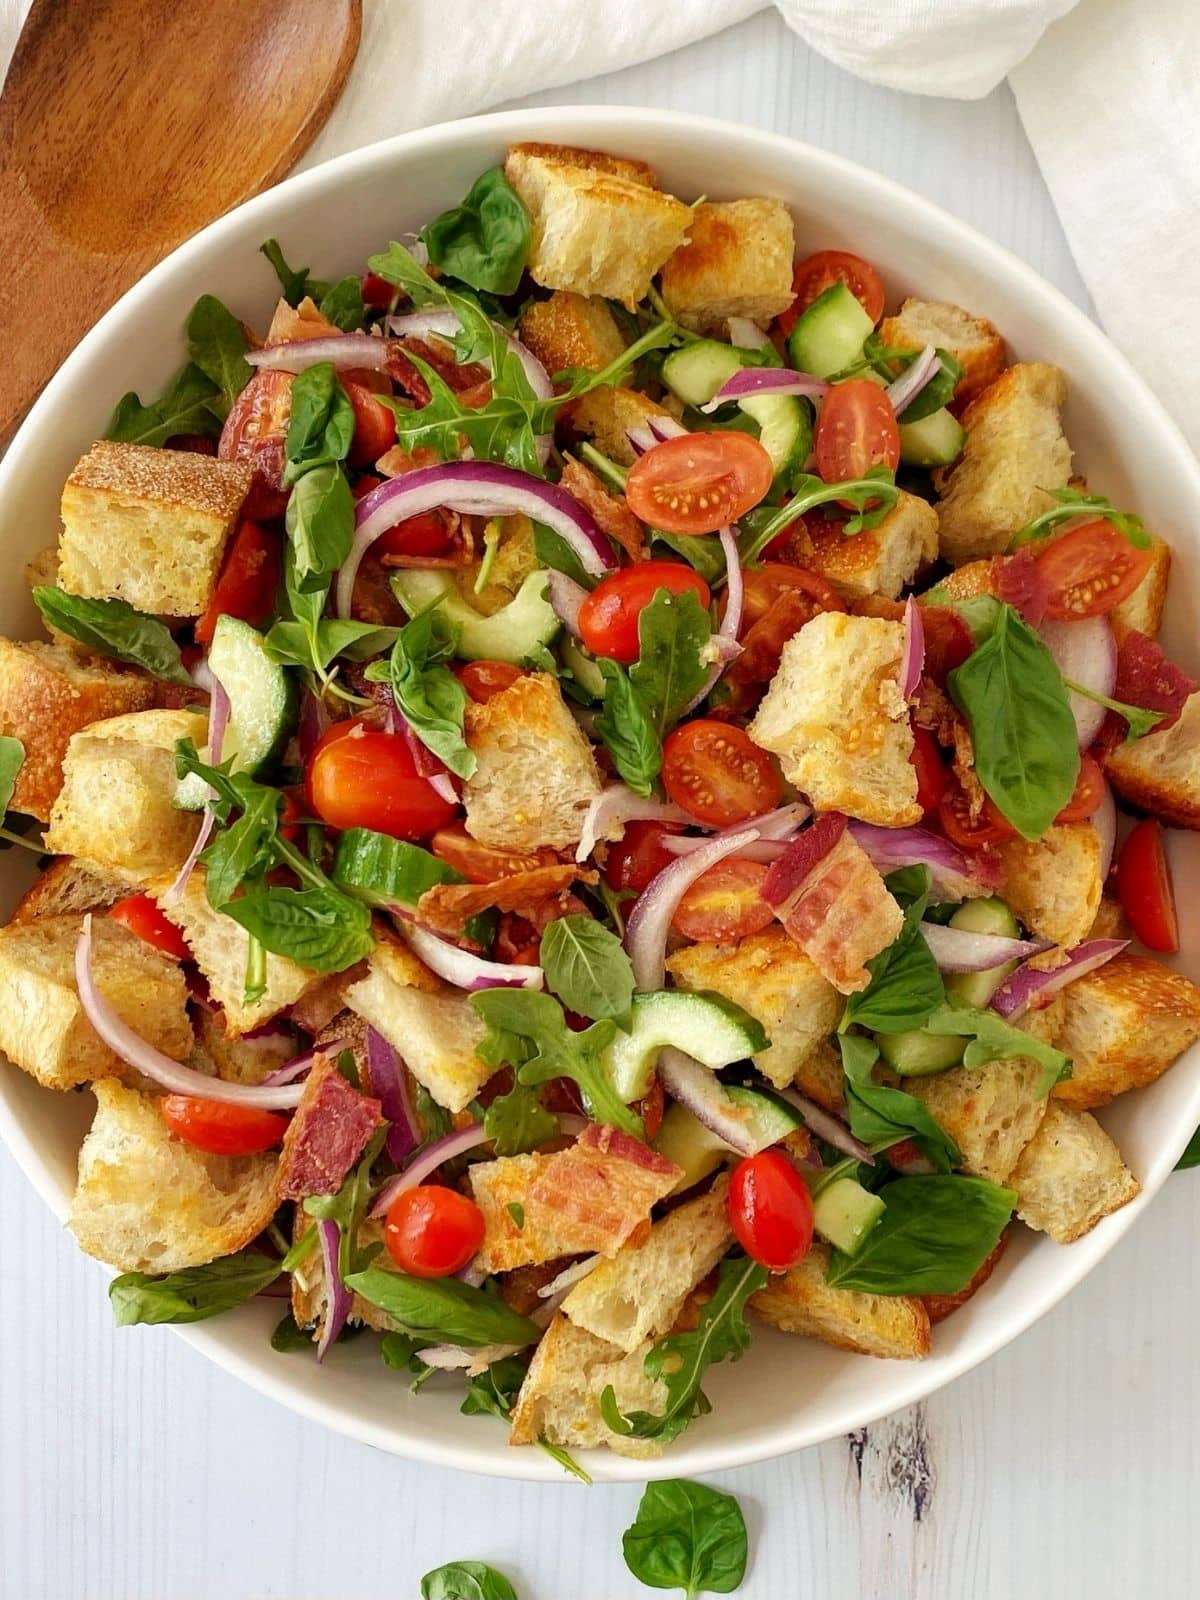 panzanella salad in a white serving bowl